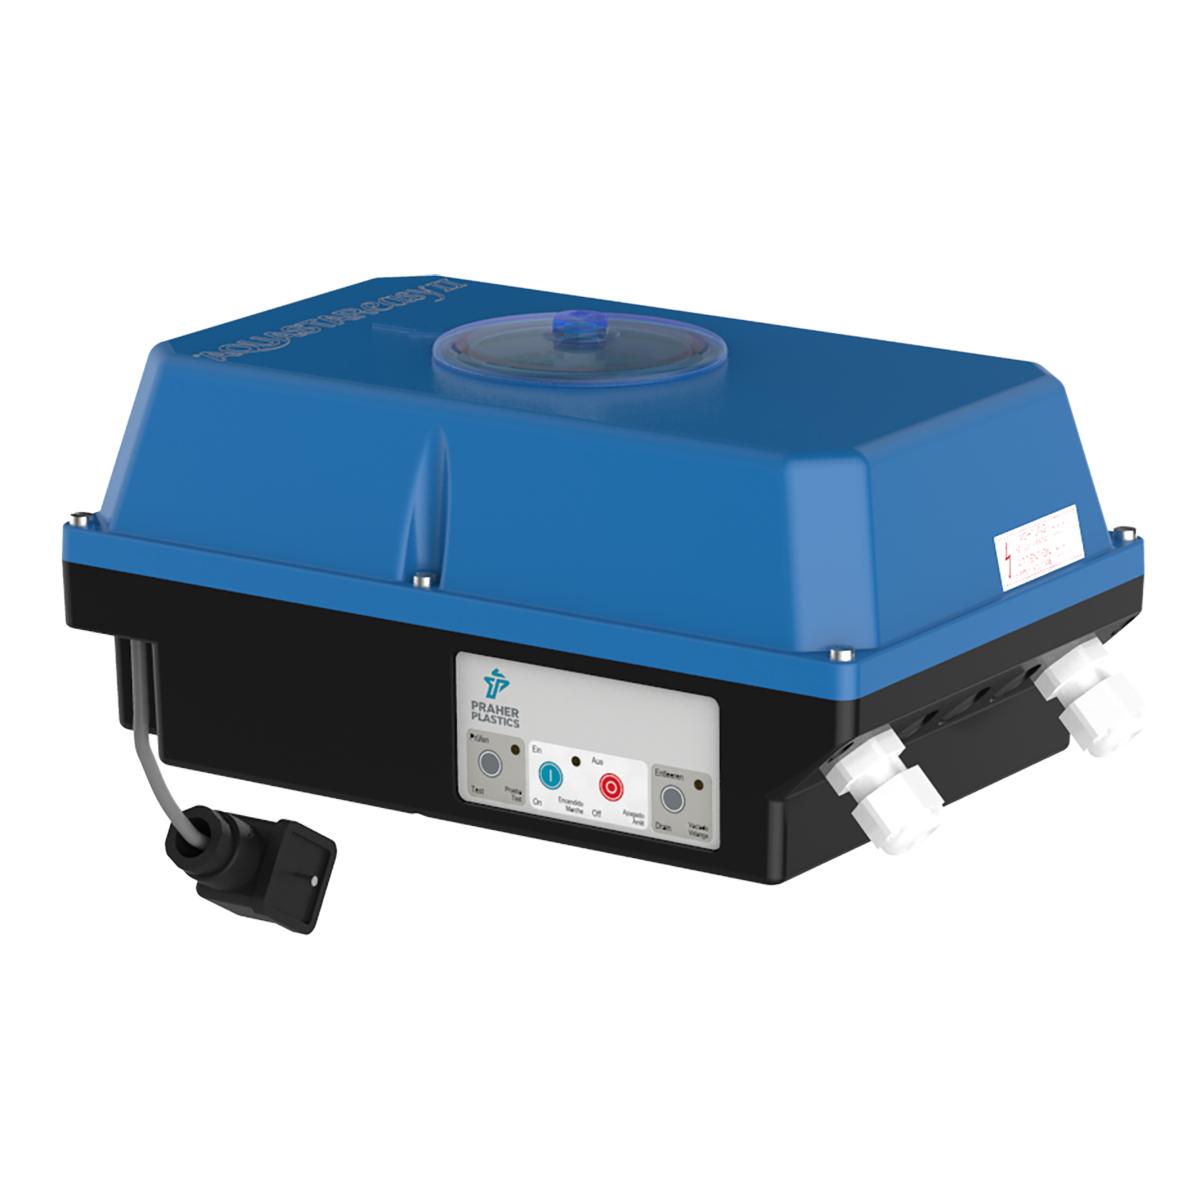 "AquaStar EasyII mit Drucksensor für V6 ND 1 1/2"" + 2"" 100-240 VAC AquaStar EasyII mit Drucksensor für V6 ND 1 1/2"" + 2"" 100-240 VAC"